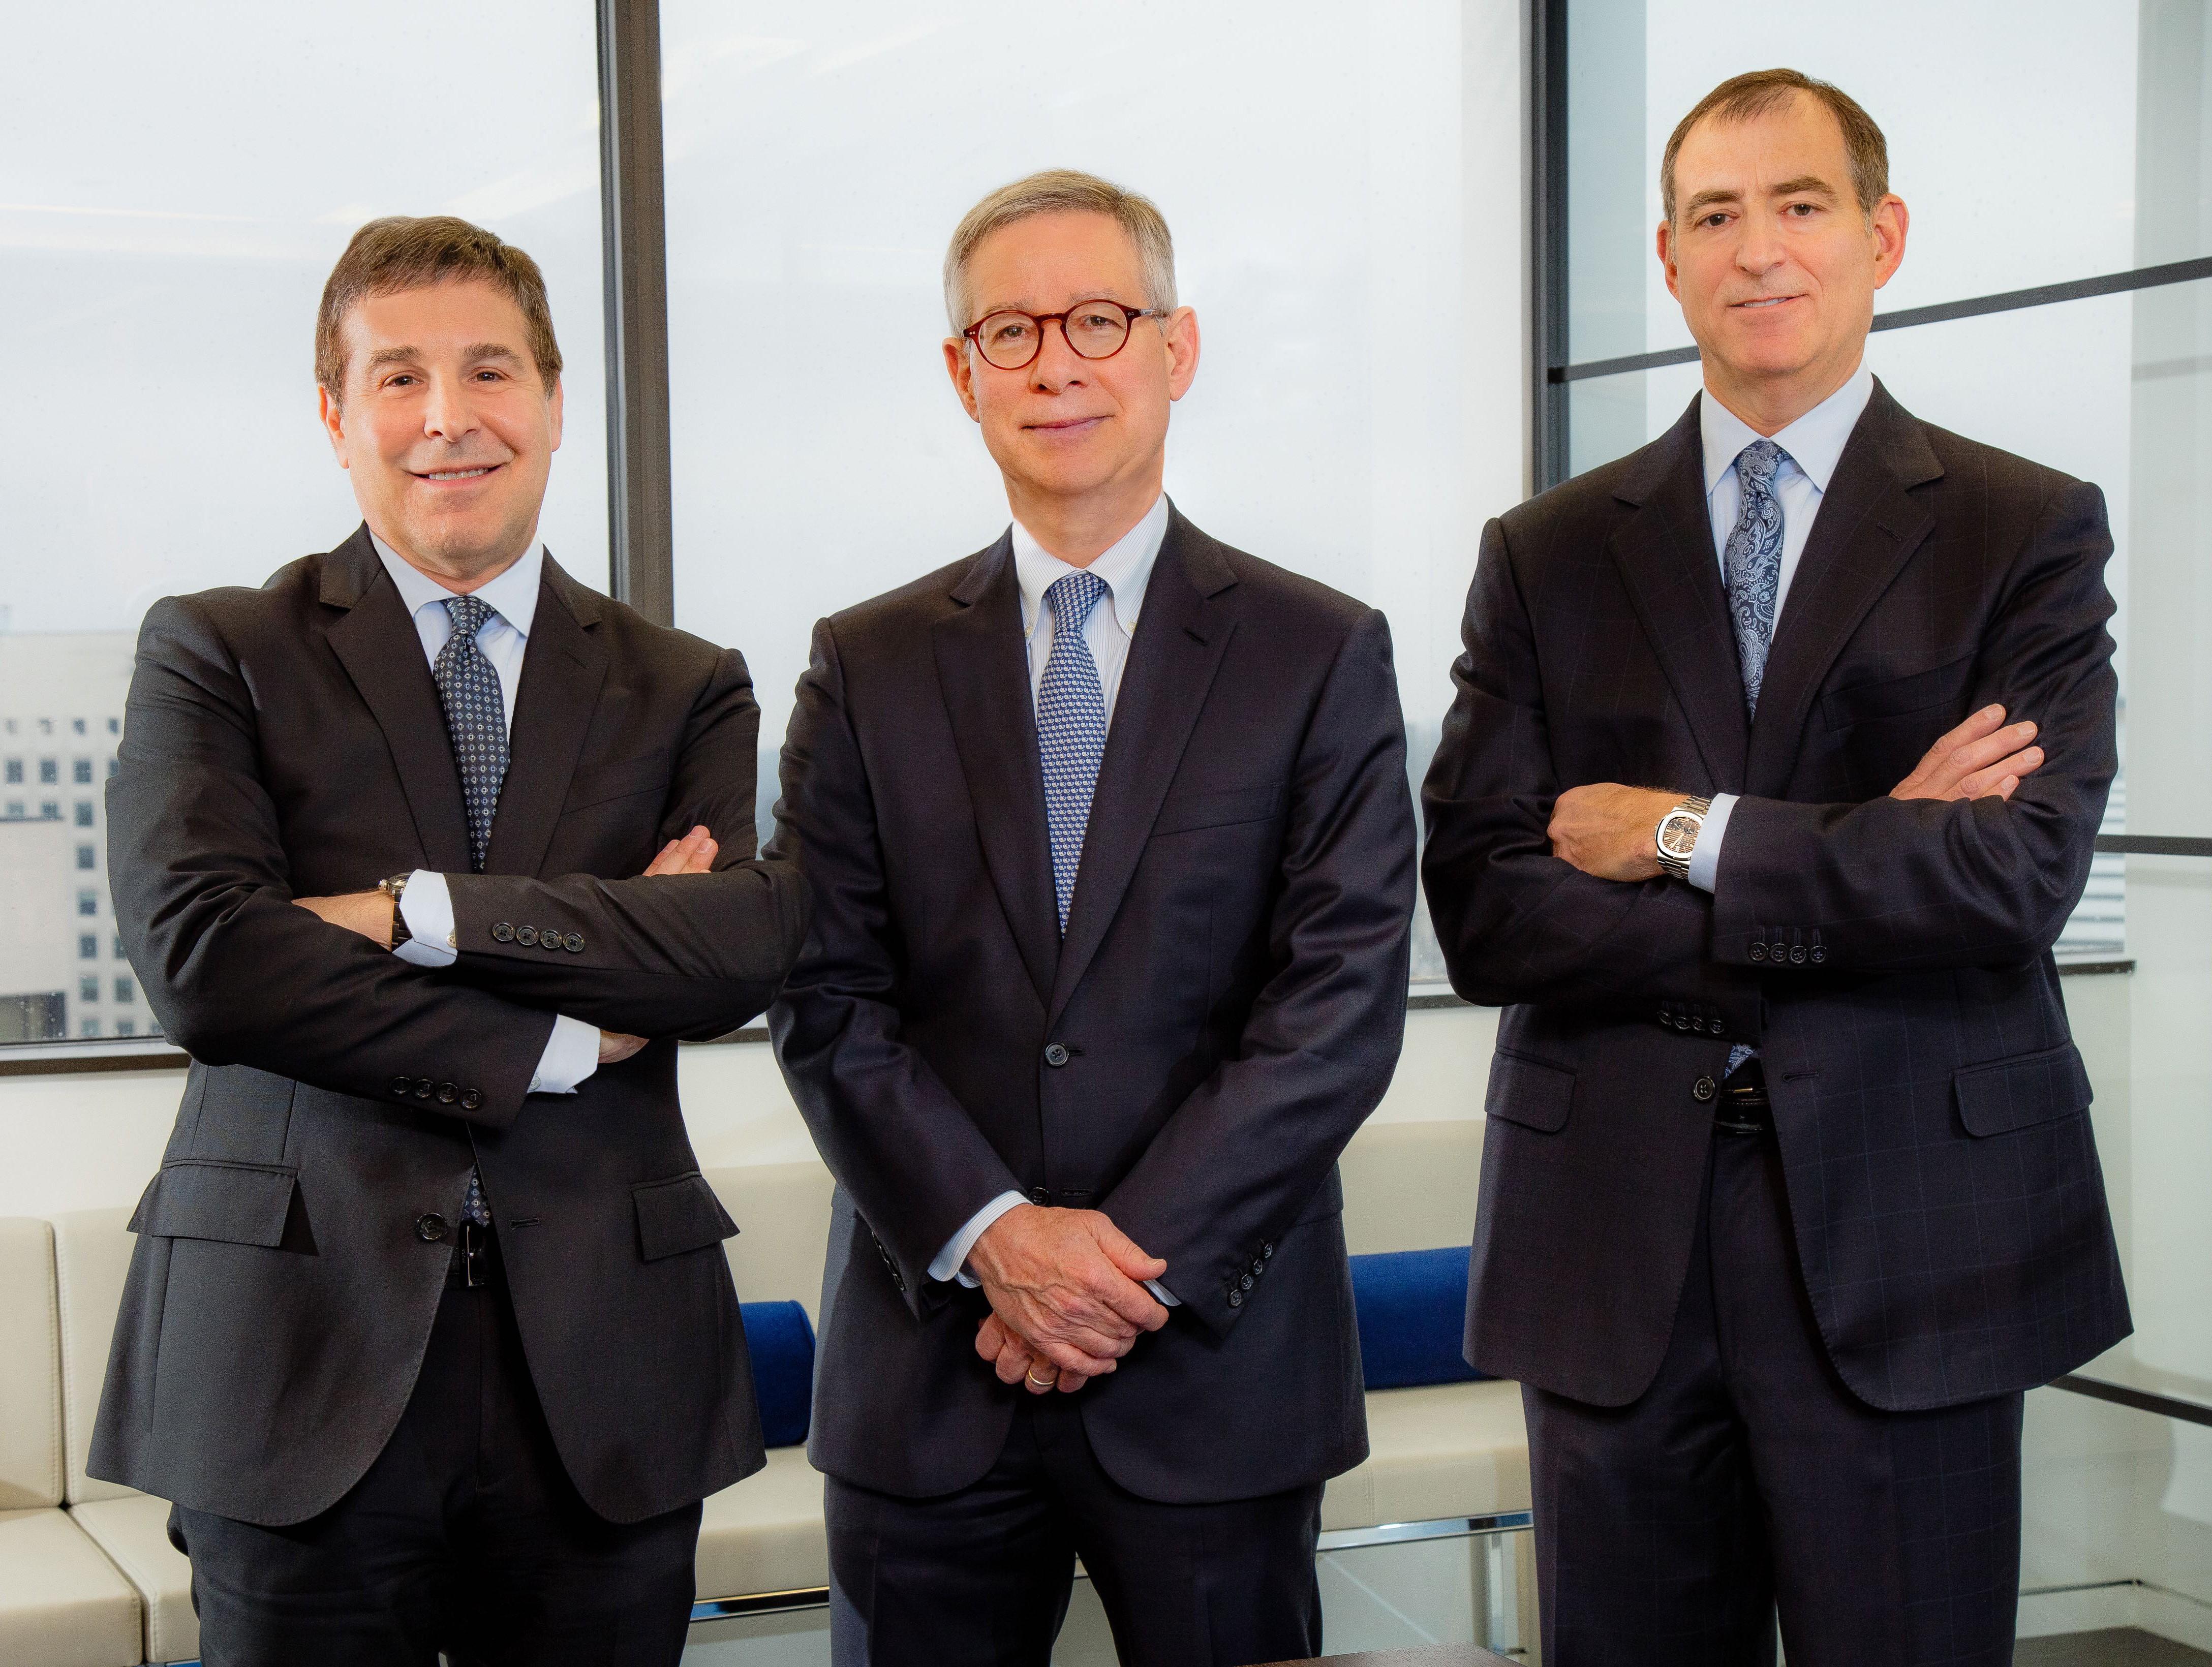 Left to right: Gary Block, David Cheek, Bruce Lane